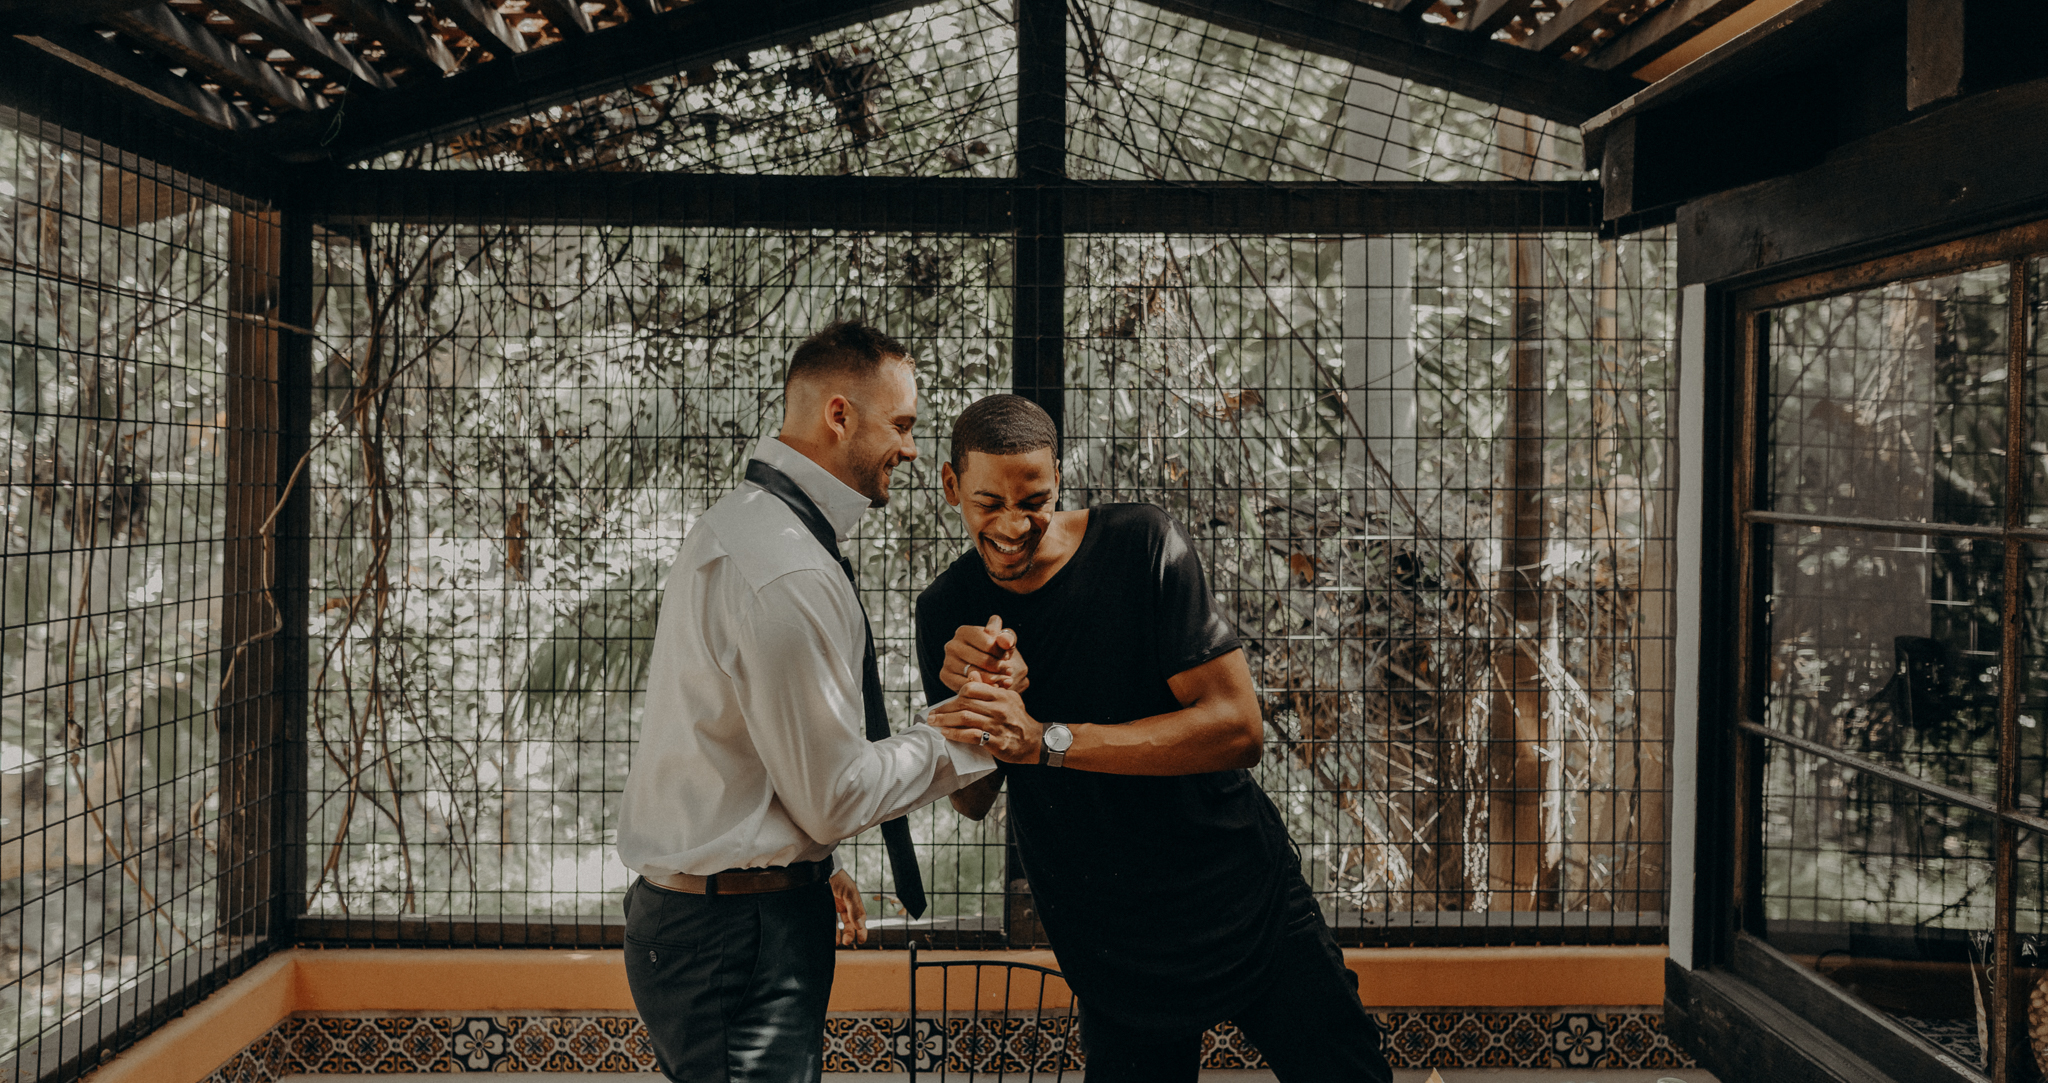 Isaiah + Taylor Photography - Rancho Las Lomas Wedding, Los Angeles Wedding Photographer-021.jpg